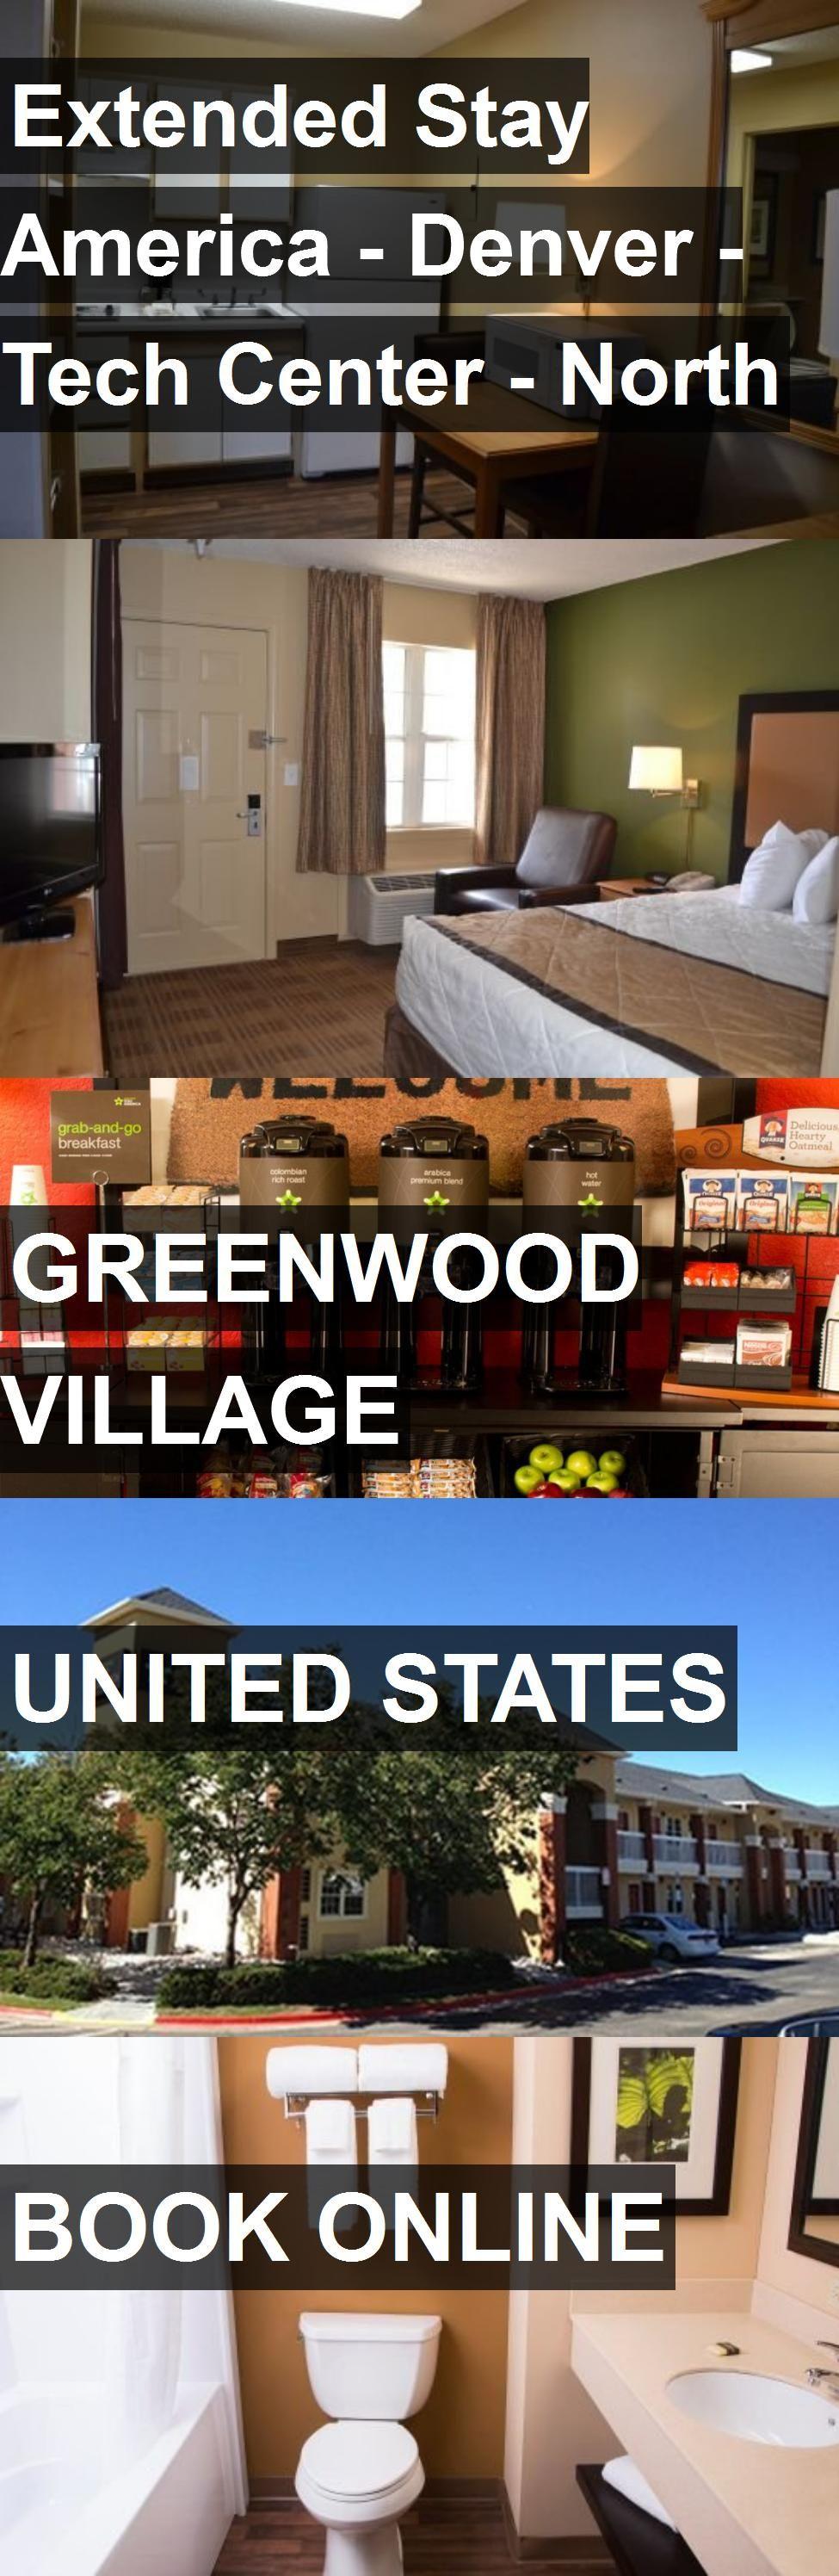 Best 25 Greenwood village ideas on Pinterest